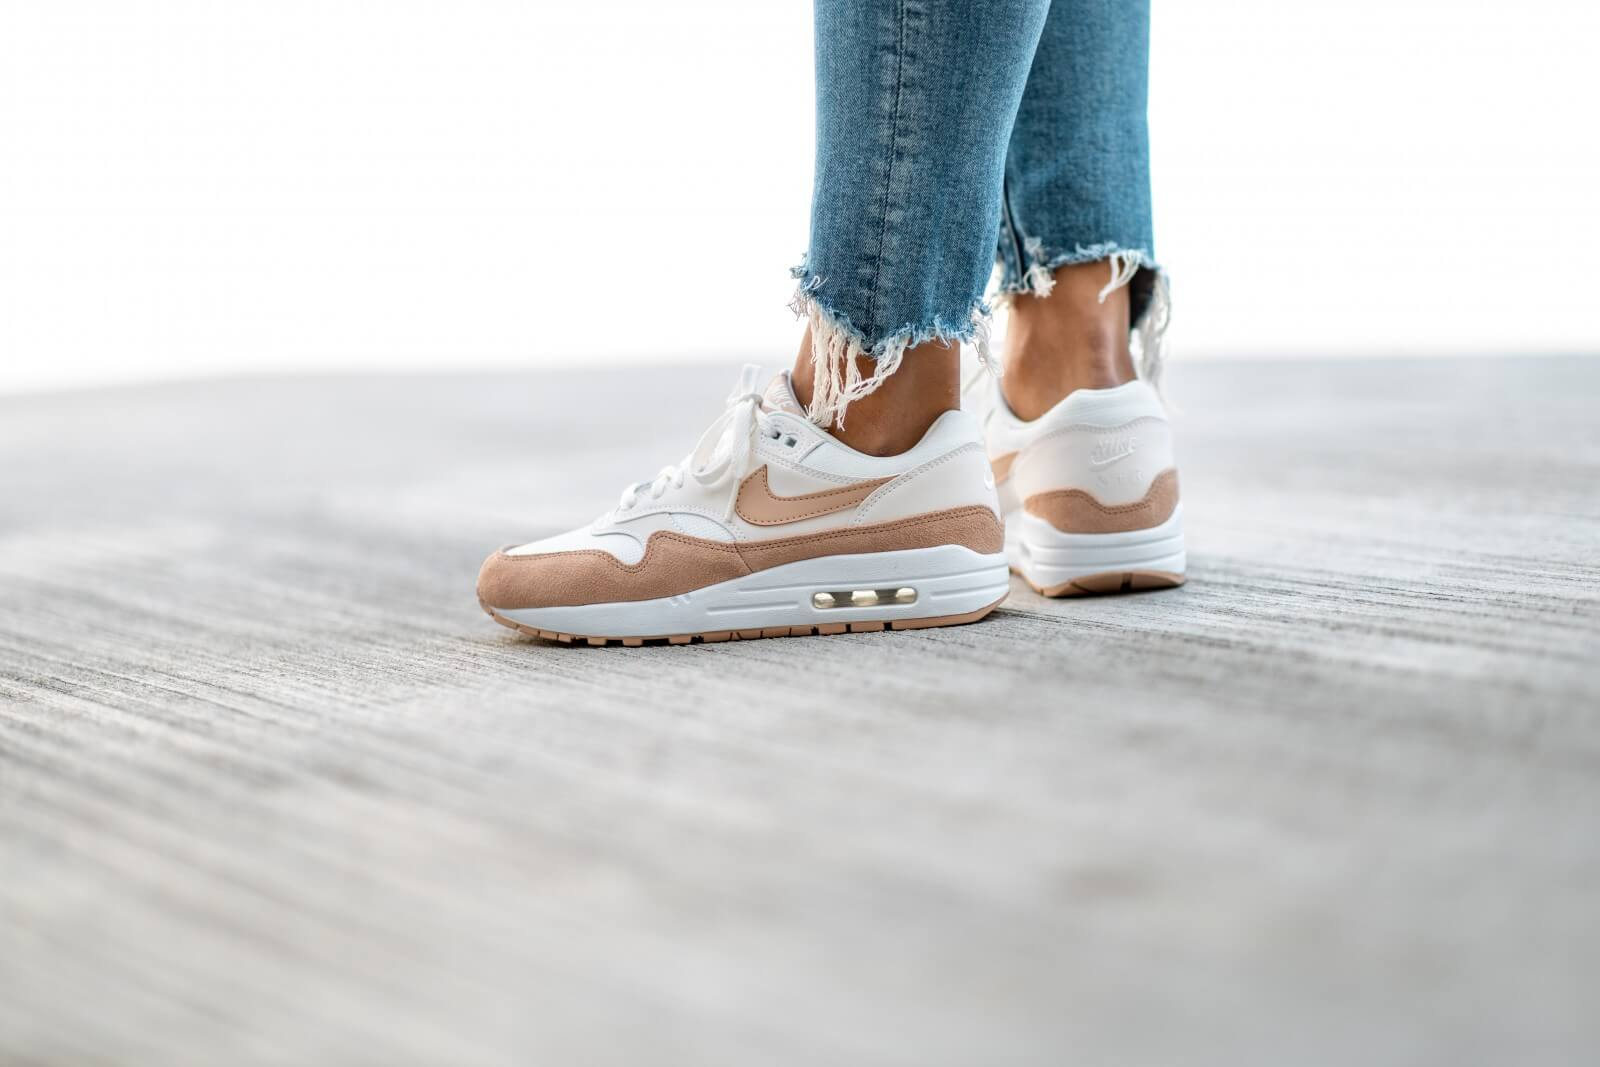 Nike Women's Air Max 1 Summit White/Bio Beige